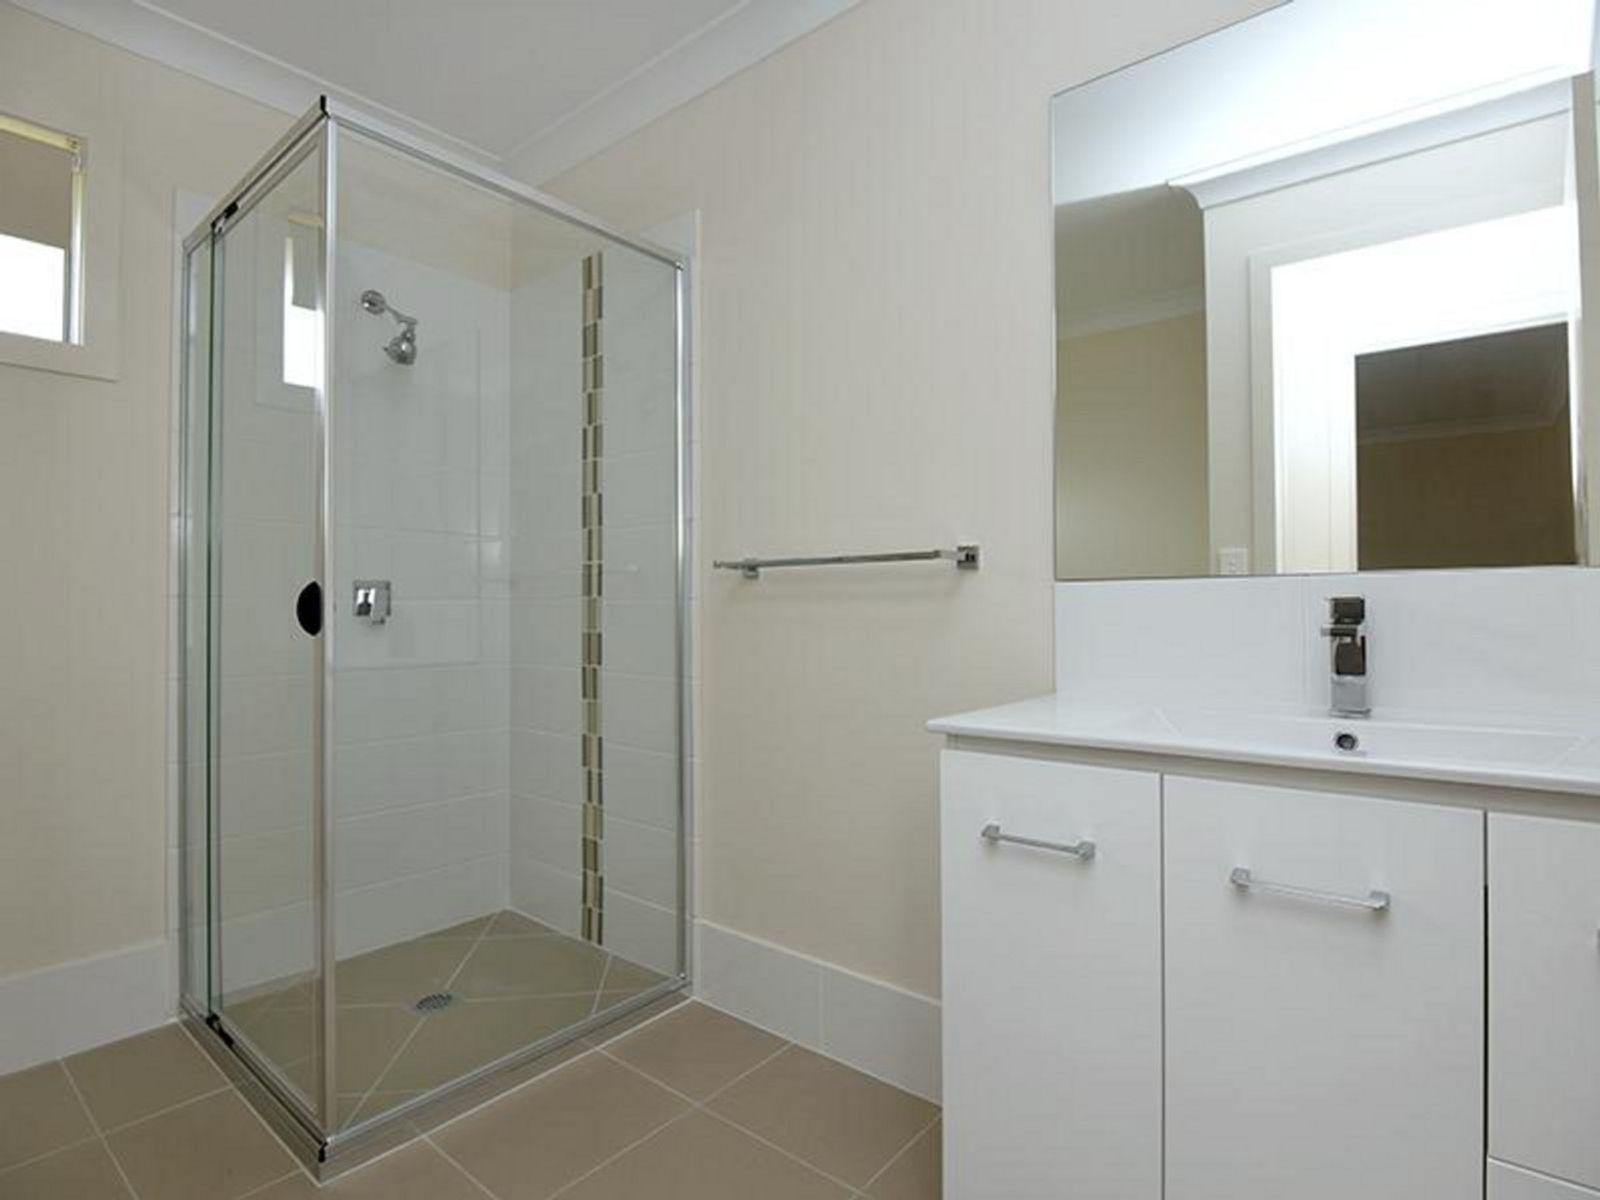 2/13 Glenwoods Drive, Glenvale, QLD 4350